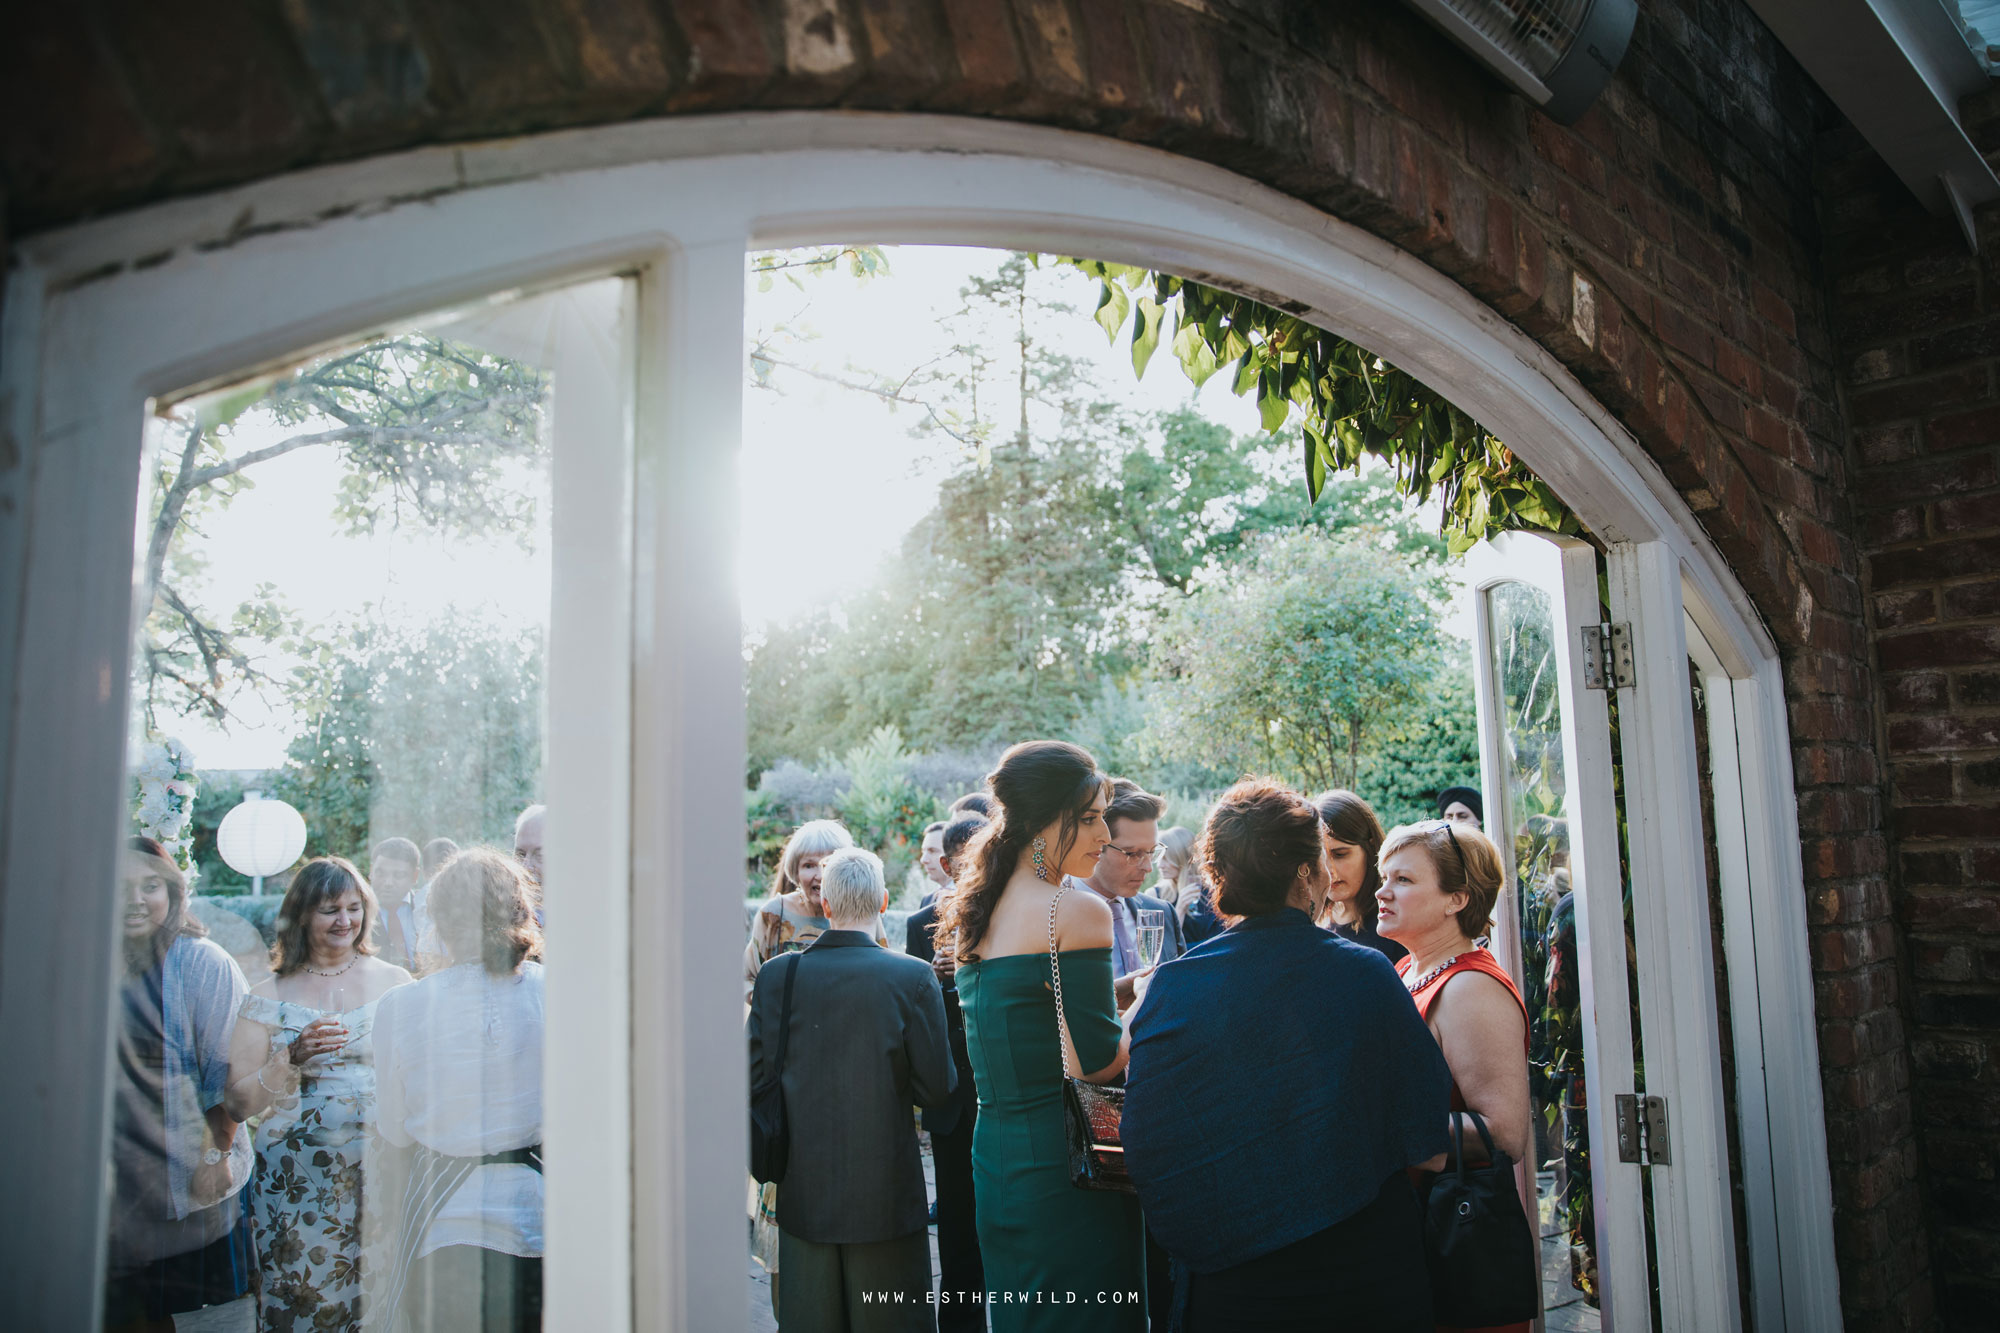 Northbrook_Park_Farnham_Surrey_London_Wedding_Hindu_Fusion_Esther_Wild_Photographer_IMG_5845.jpg